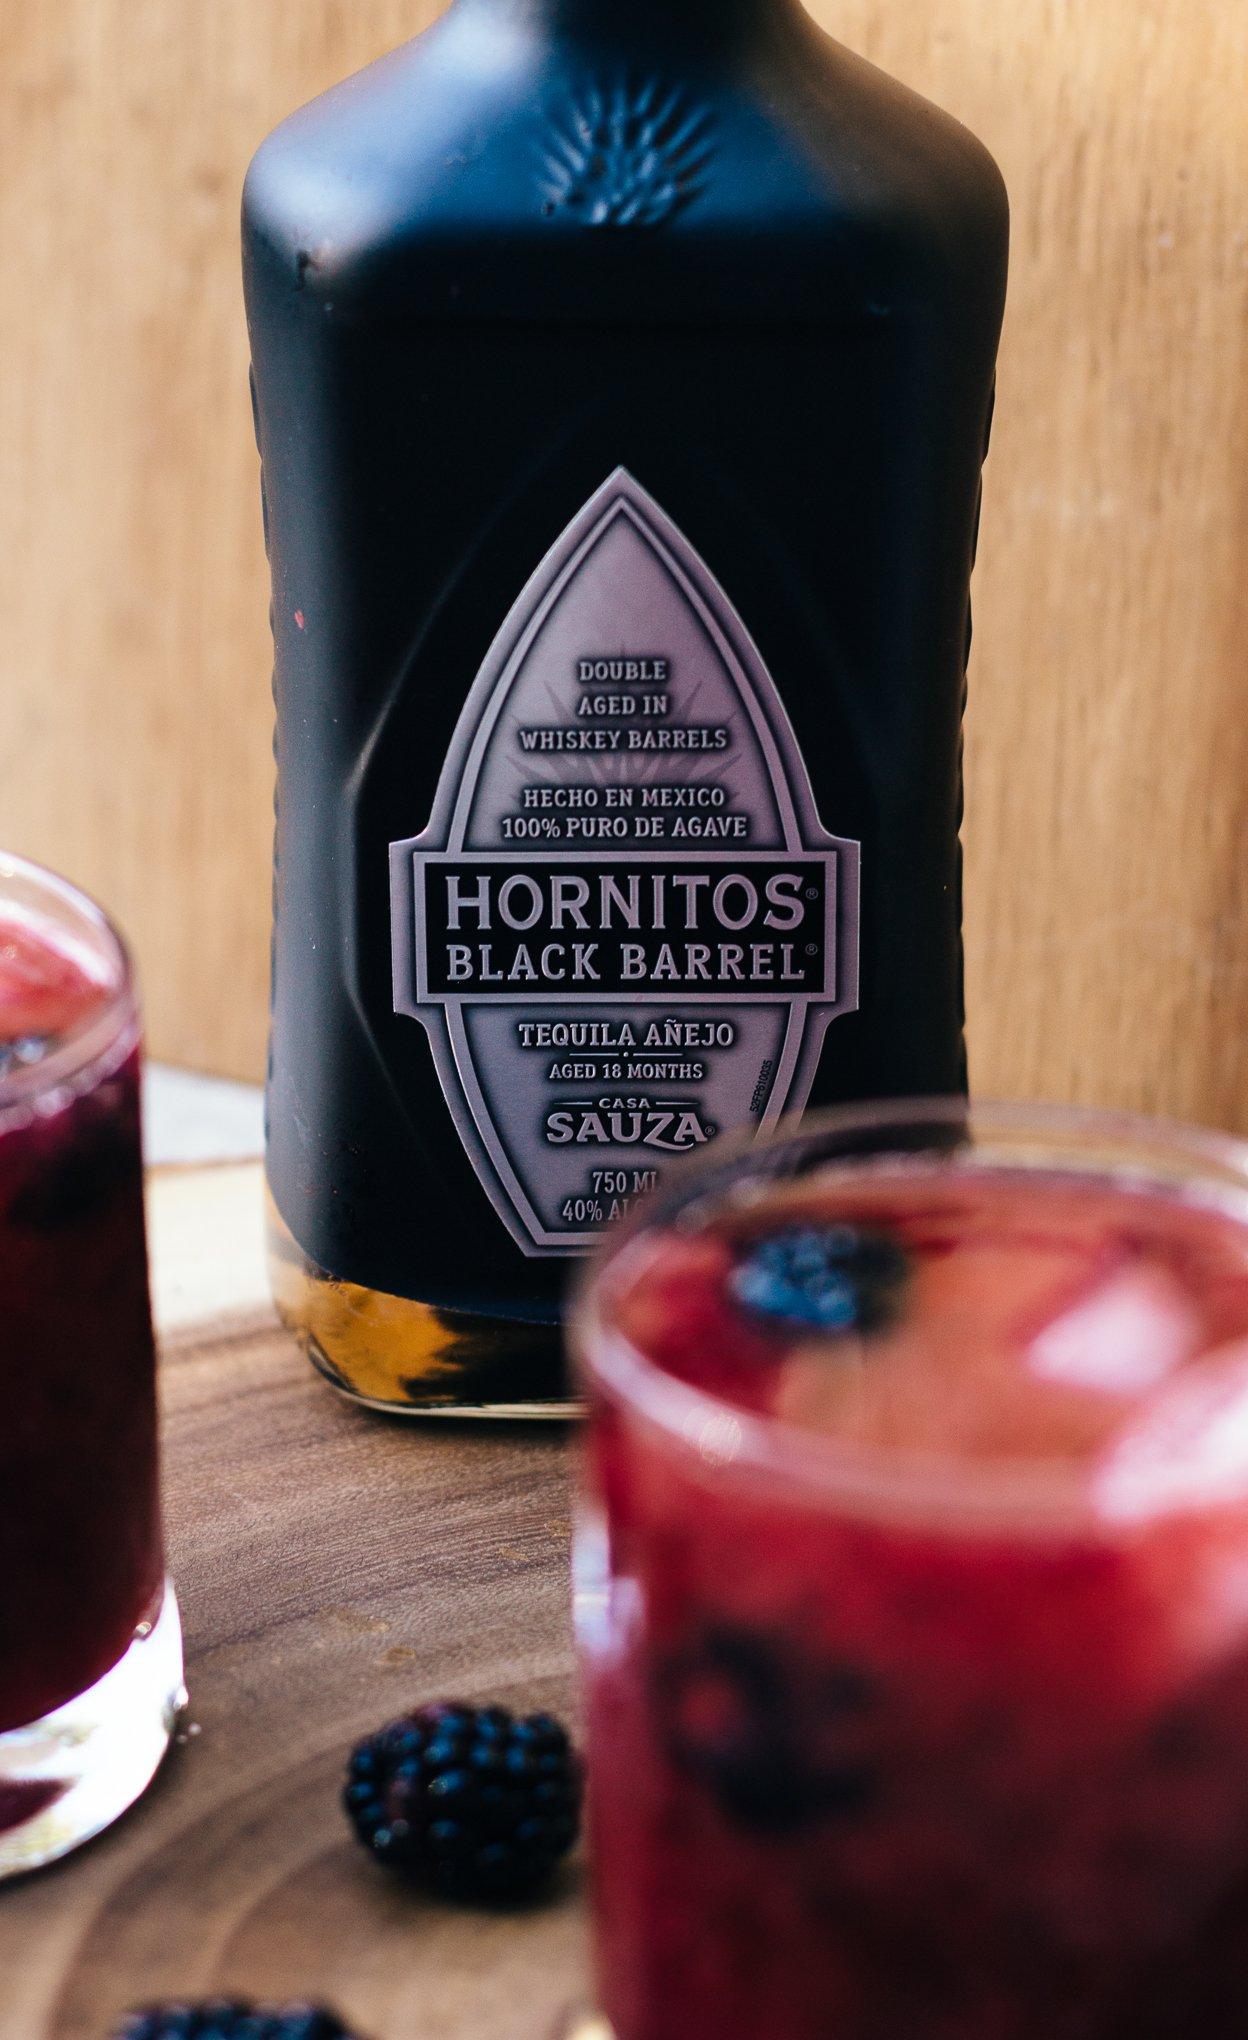 blackberry margaritas, margarita recipe, cocktail recipes, how to make a margarita, hornitos tequila